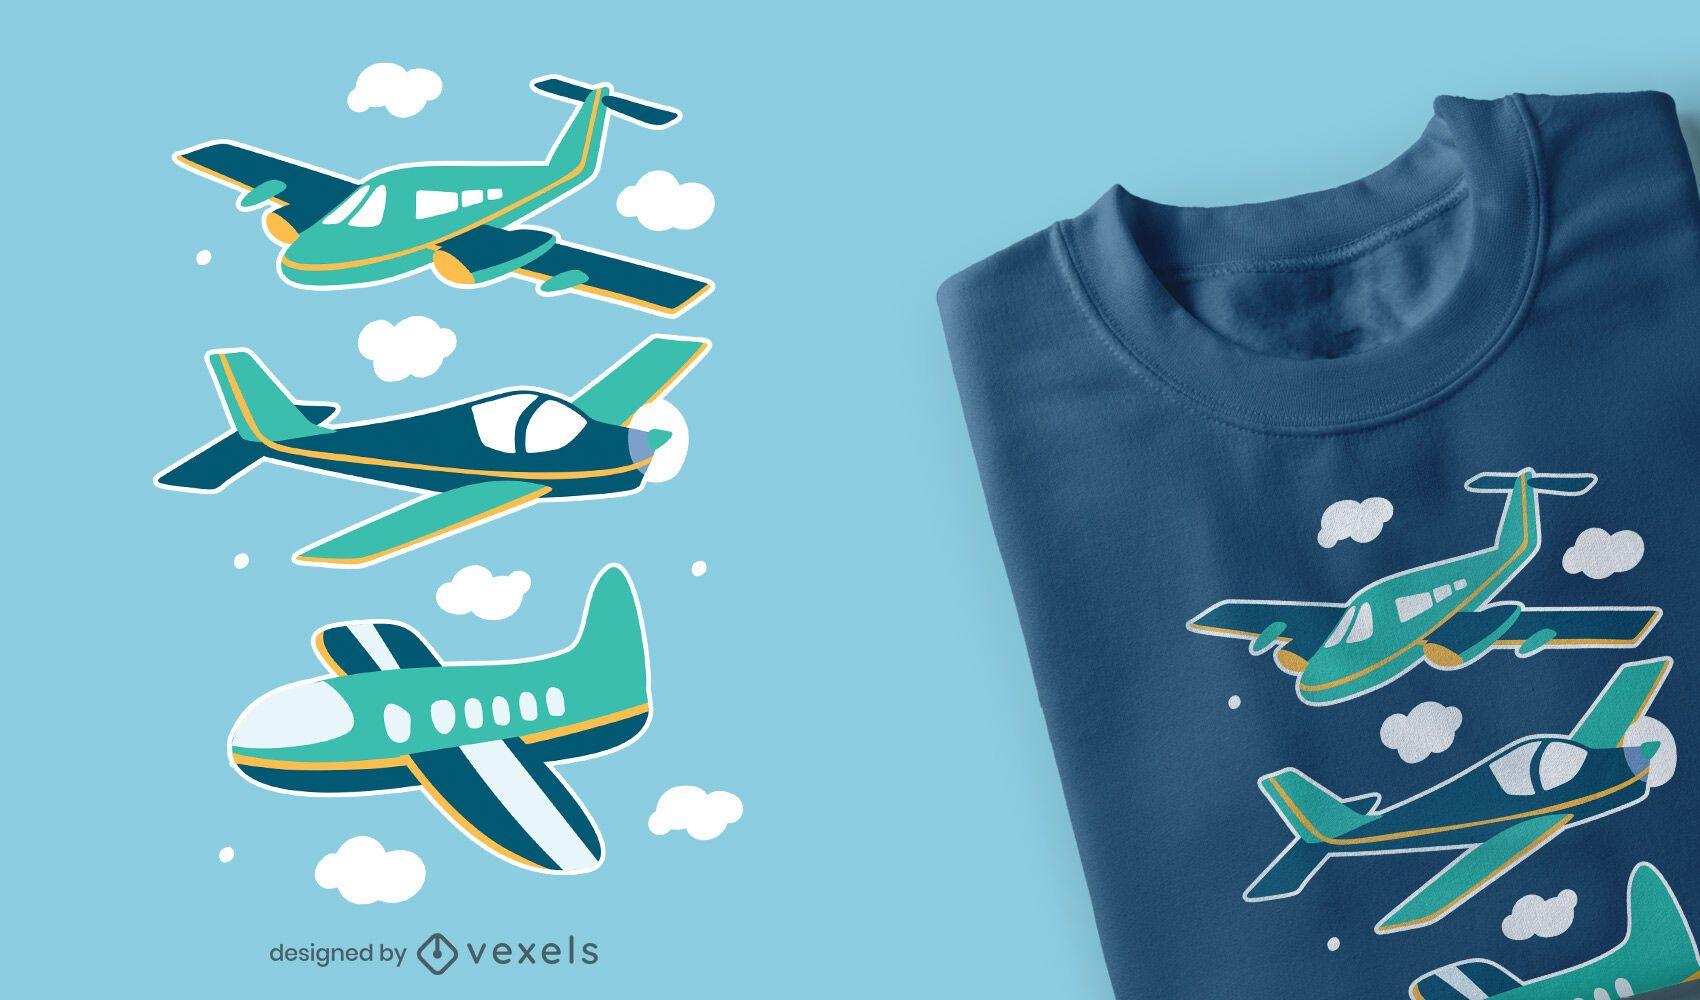 Dise?o de camiseta de aviones